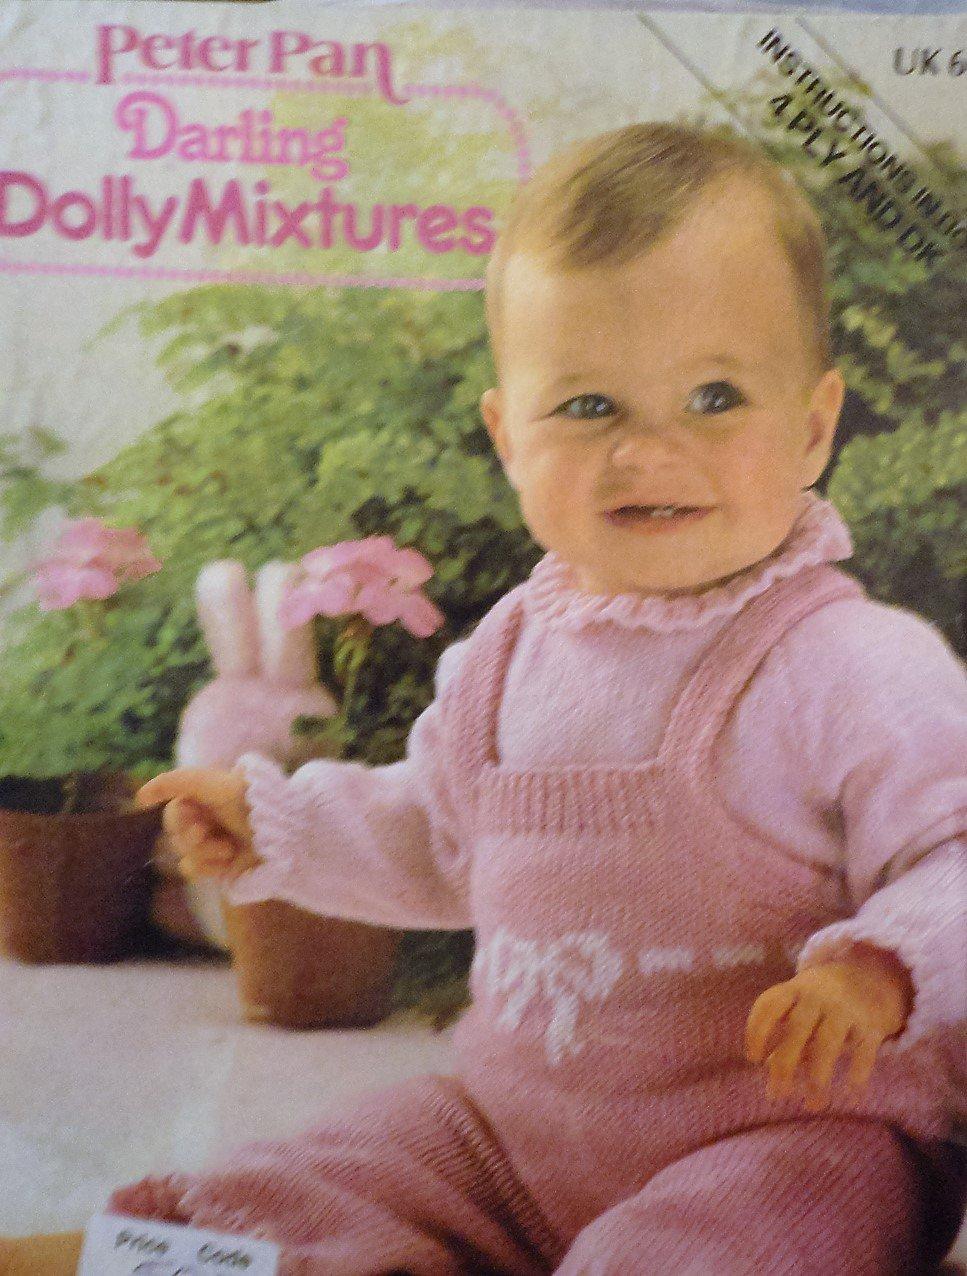 Peter Pan Baby Knits 5 Darling Dolly Mixtures Knitting Pattern  UK terms